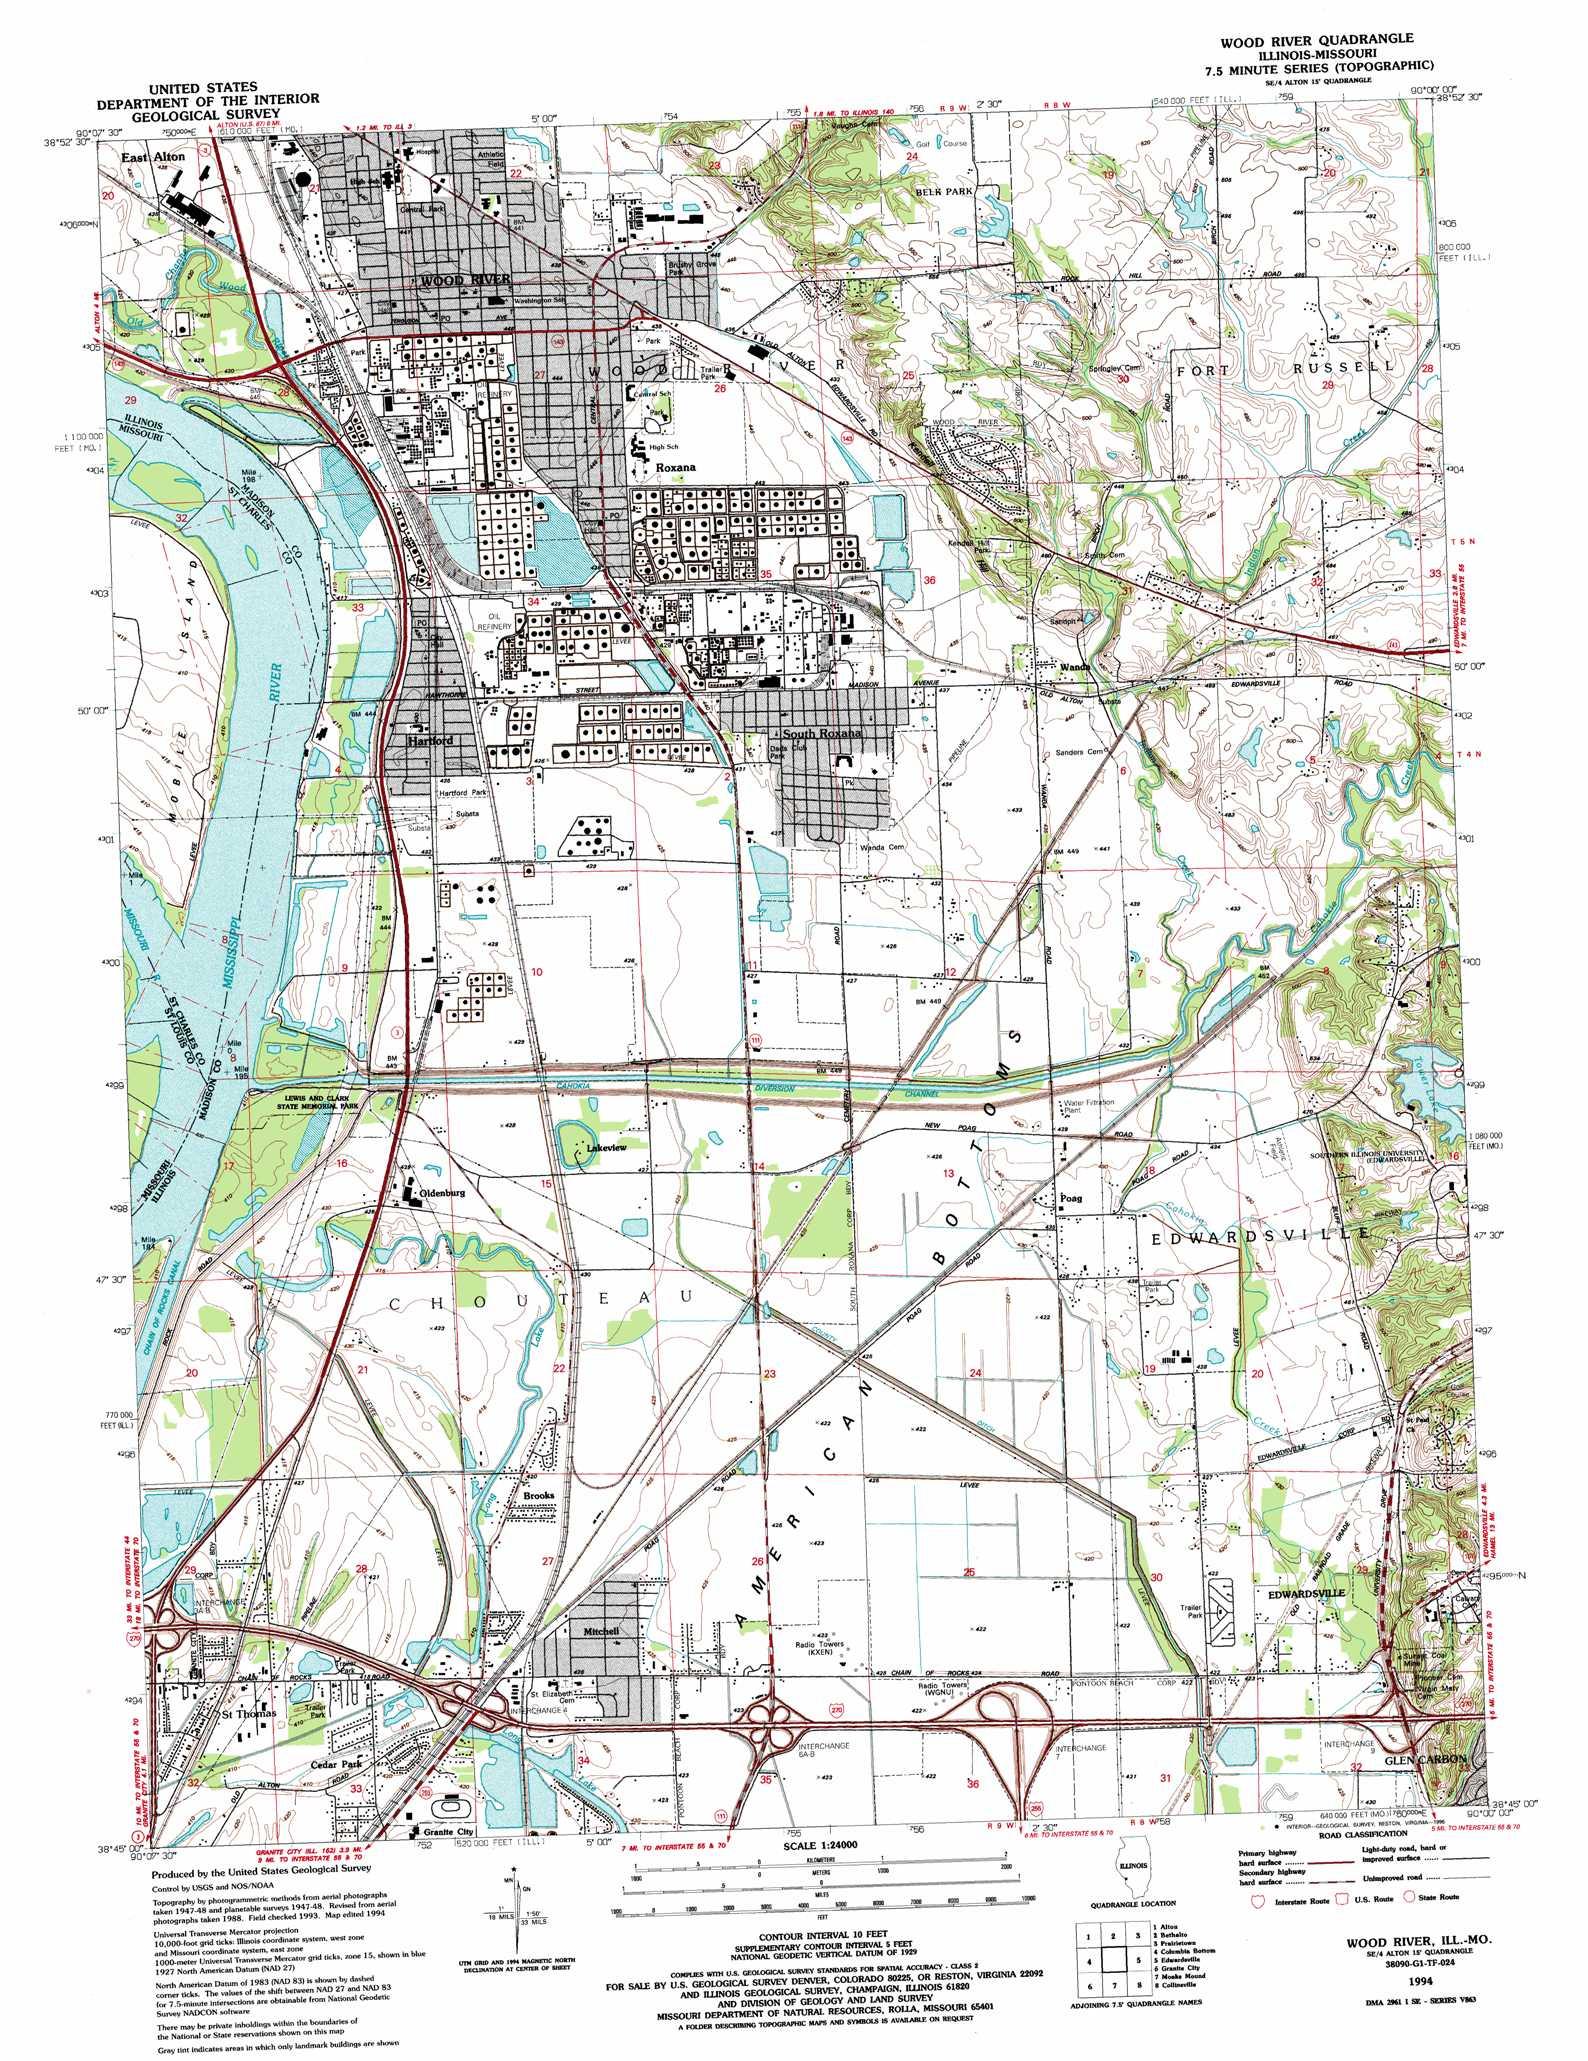 Wood River Il Elevation : Wood river topographic map il mo usgs topo quad g